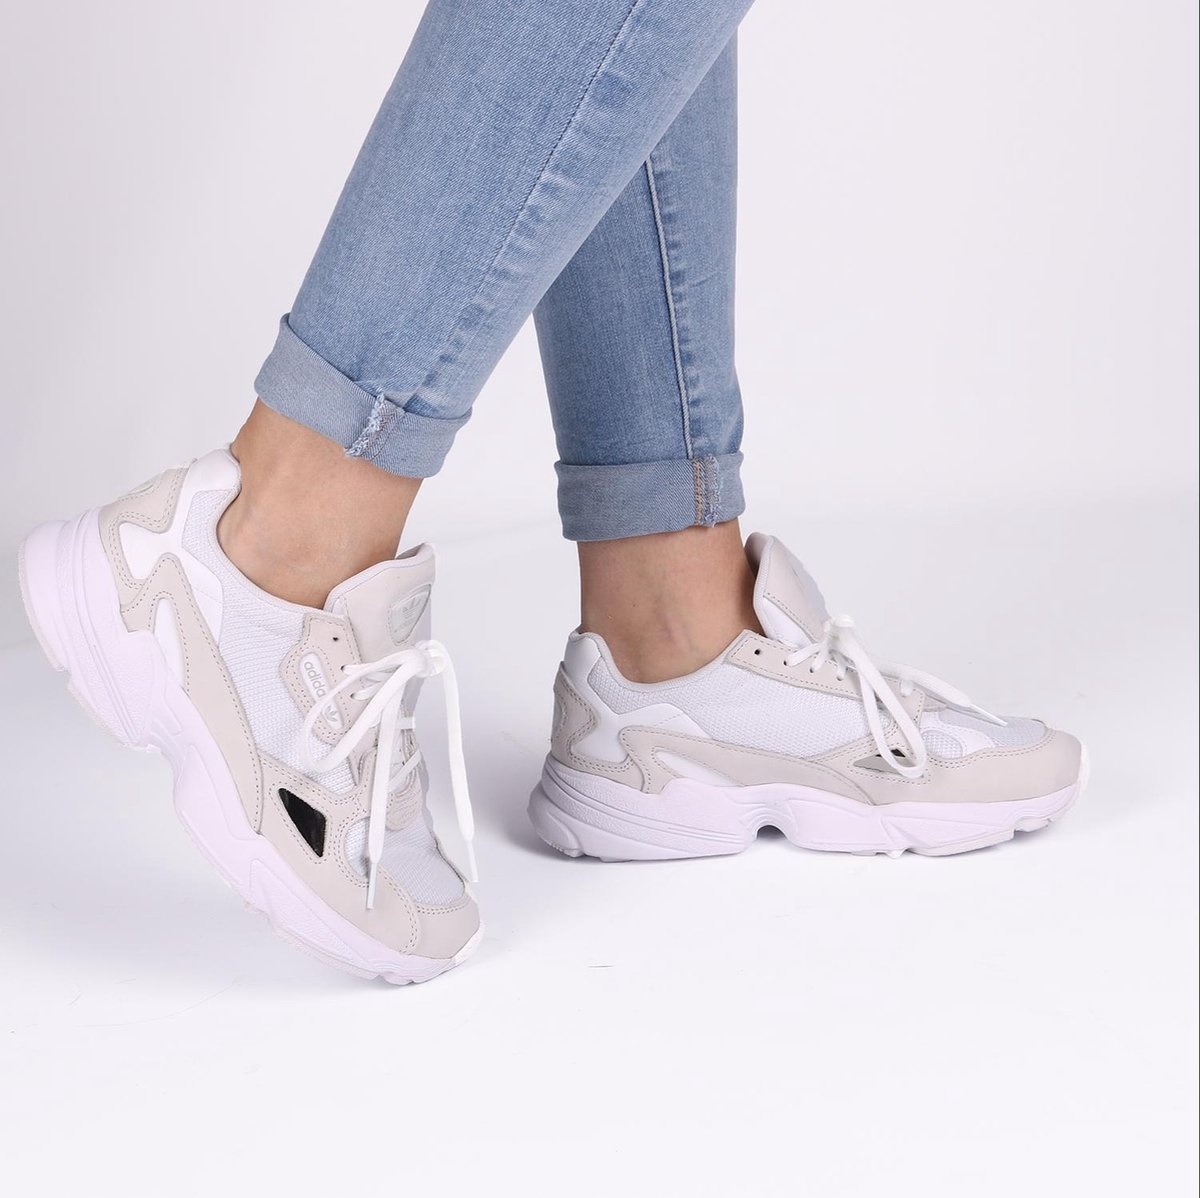 Adidas - FALCON white / UK 6.5